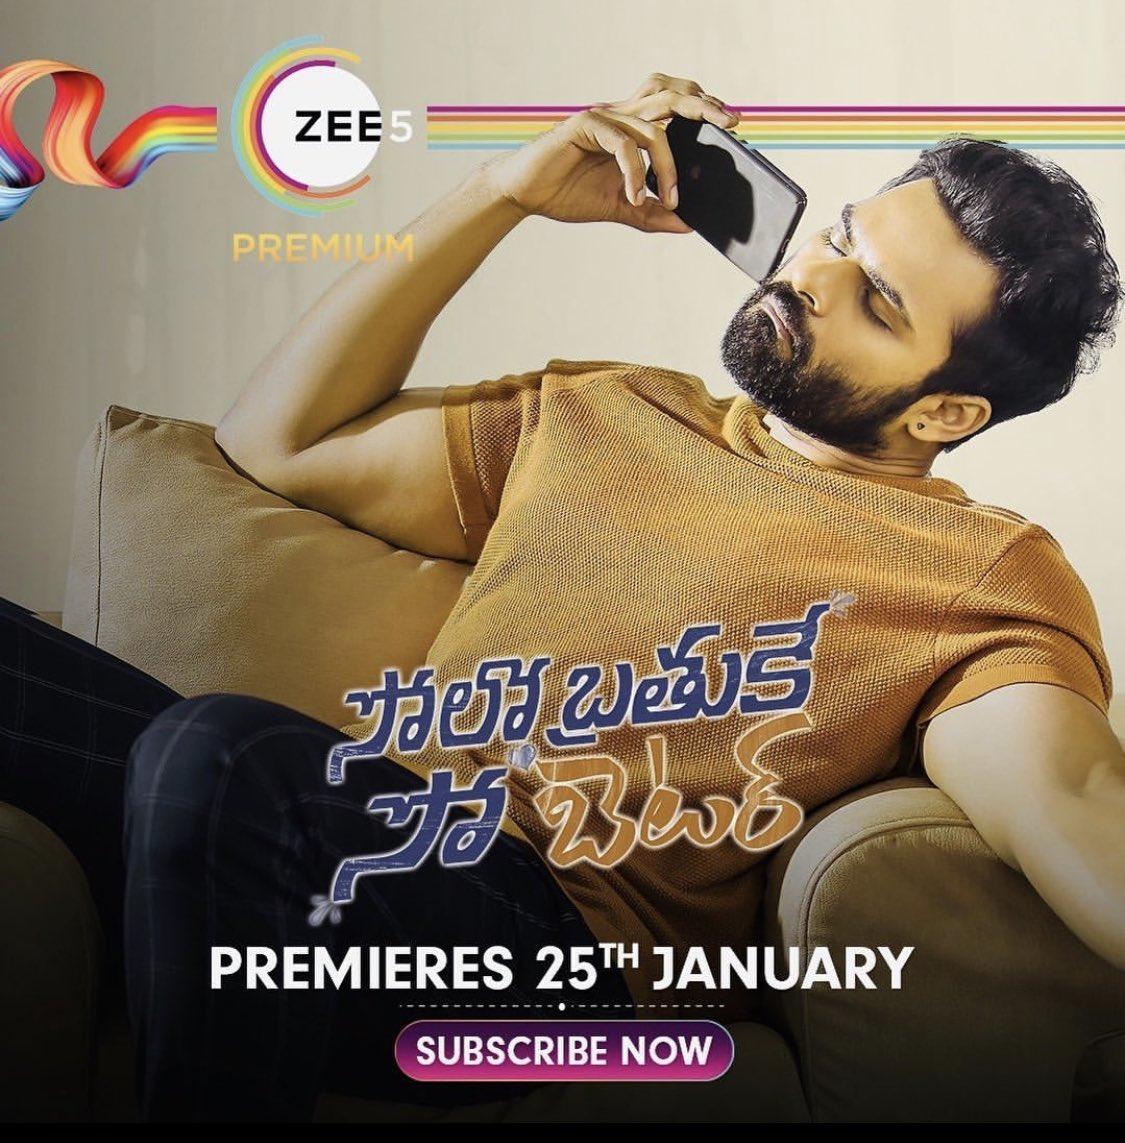 Streaming Info : Telugu film #SoloBrathukeSoBetter will be available for streaming from 25th January on @ZEE5Premium #saidharamtej